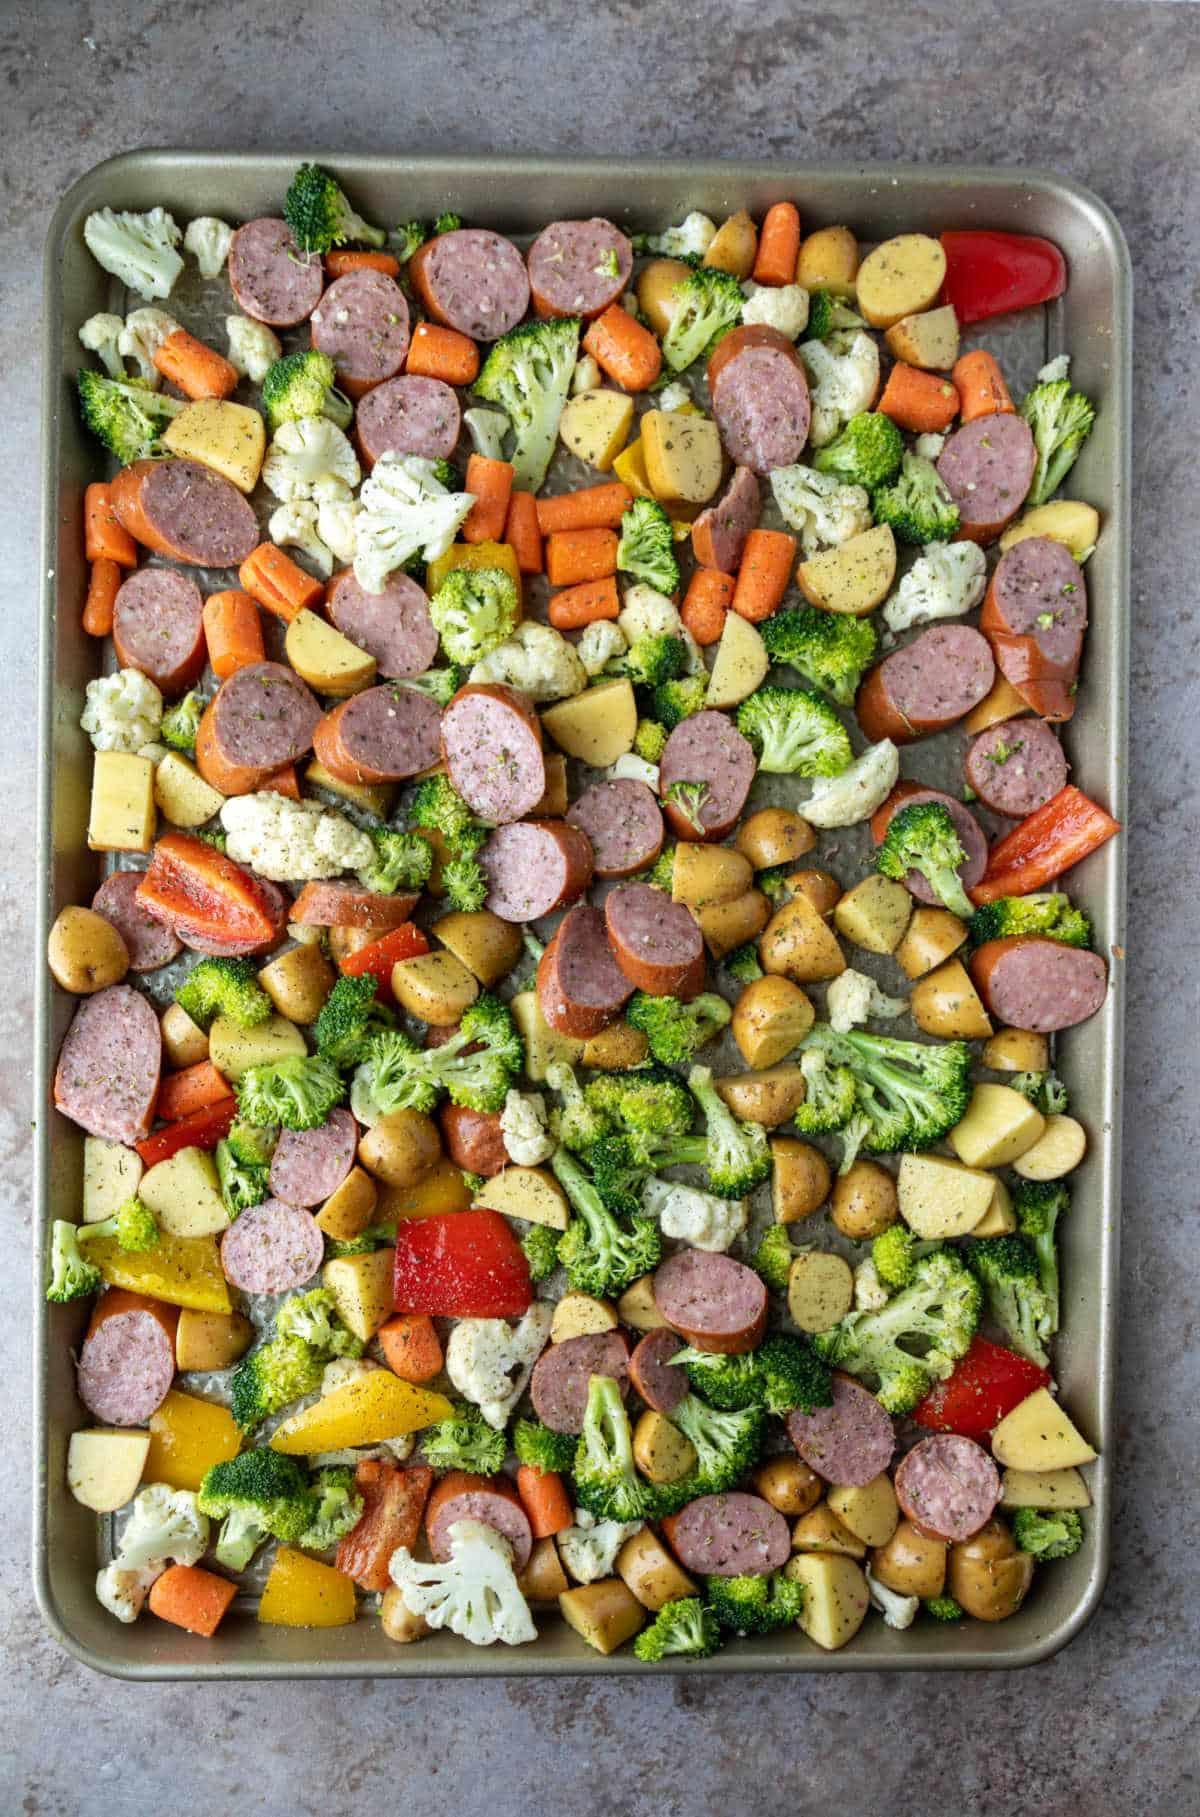 Sausage and veggies on a sheet pan.